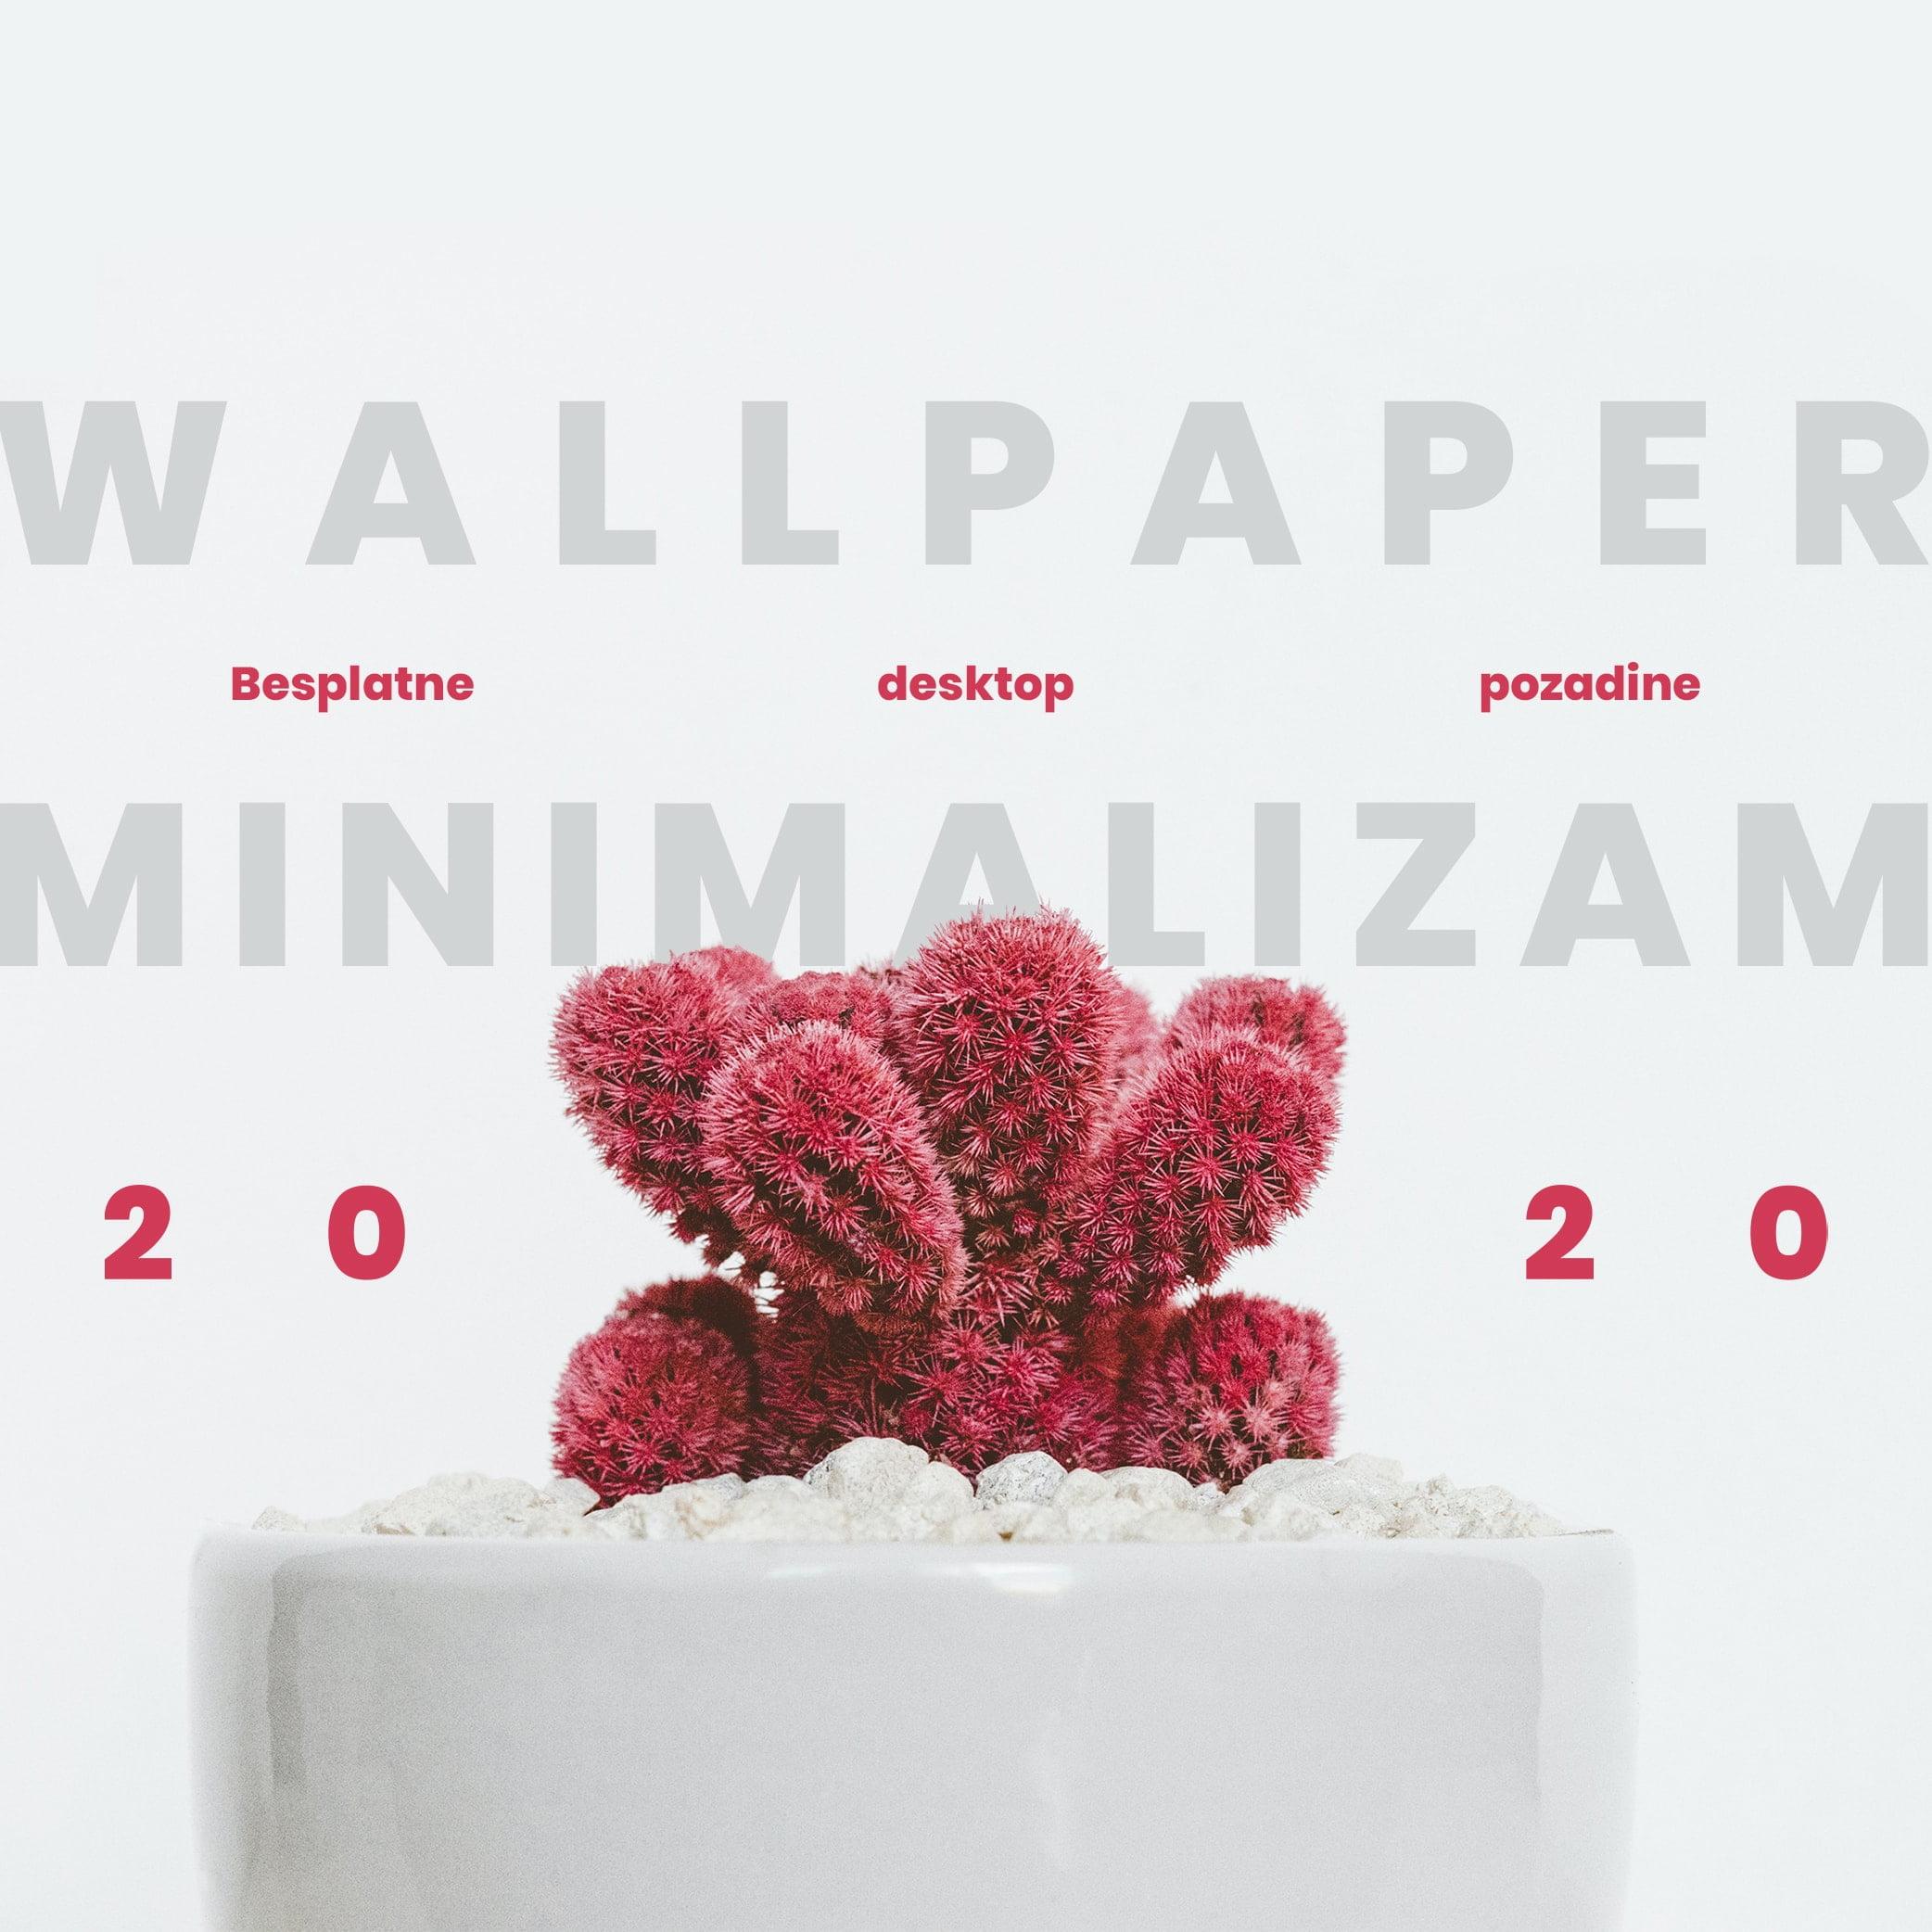 52779Wallpaper minimalizam – Besplatne desktop pozadine za 2020.